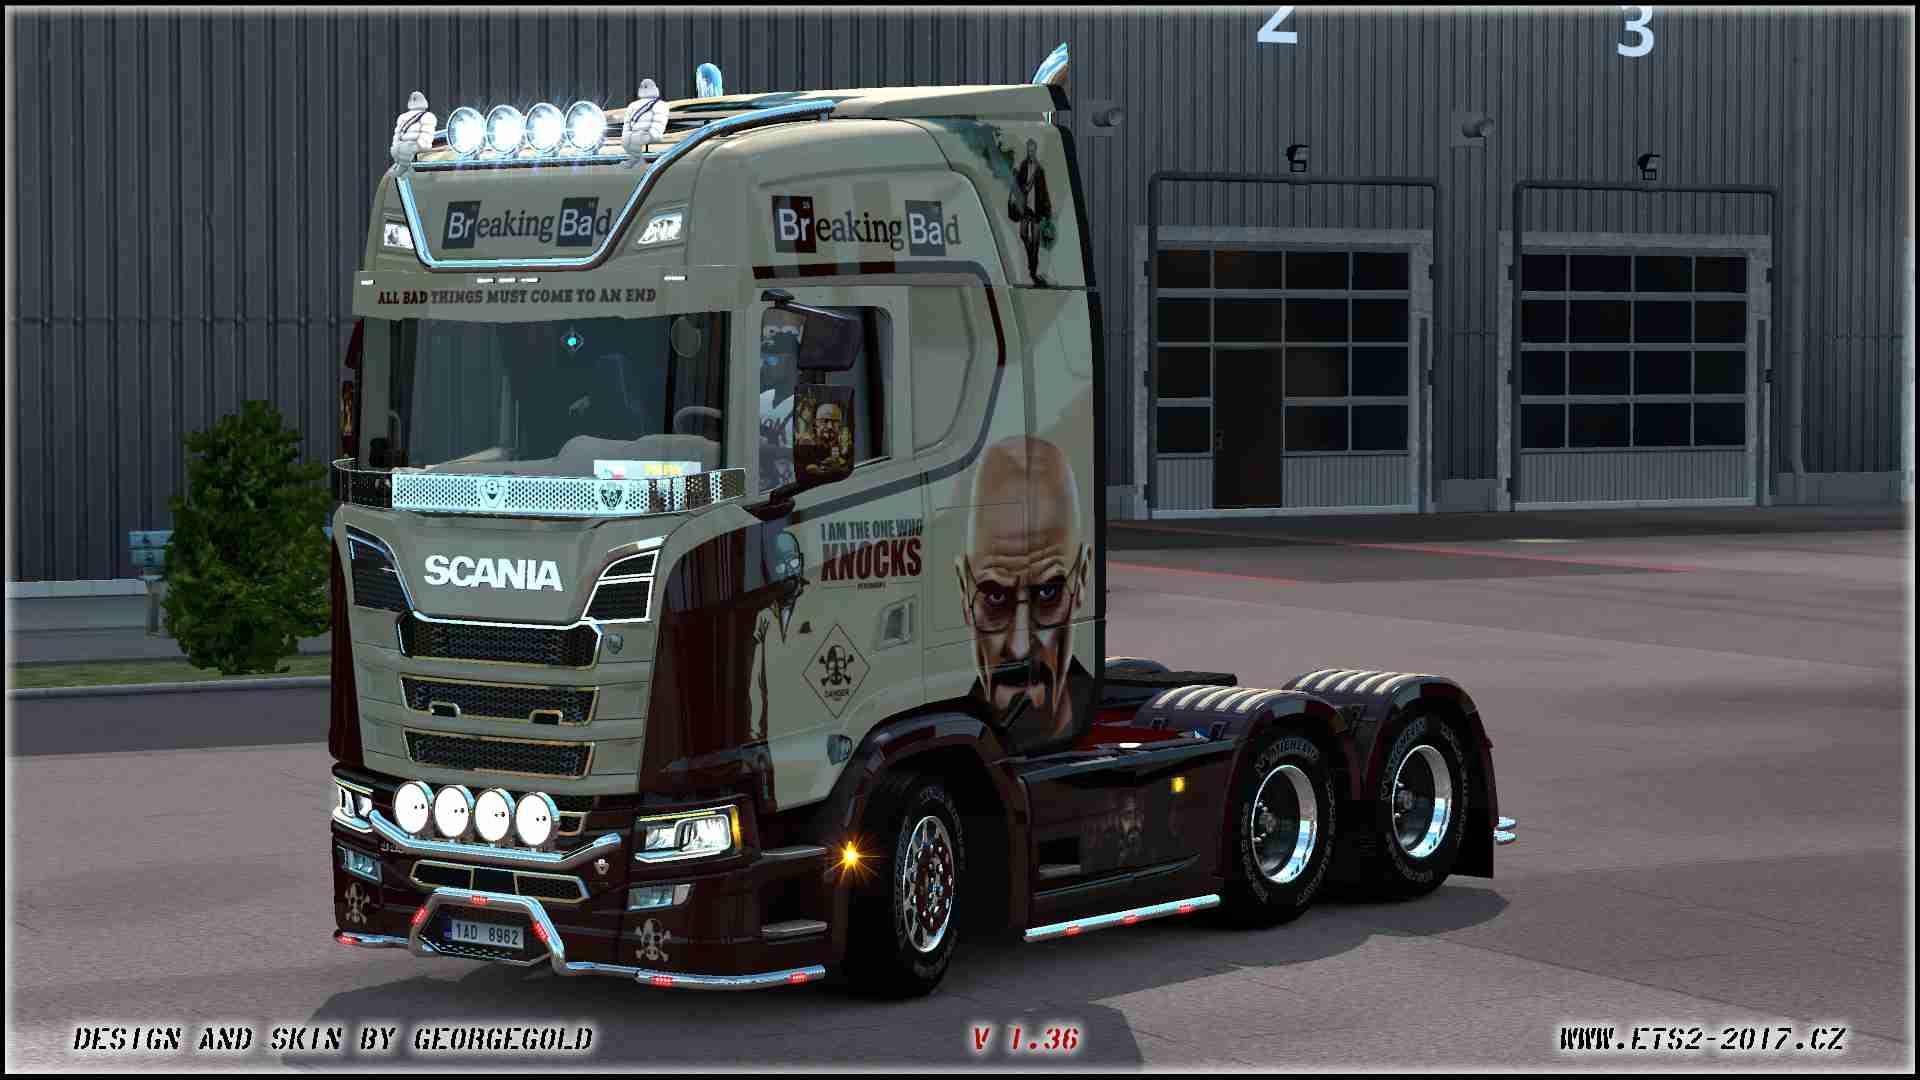 Scania S NG Breaking Bad